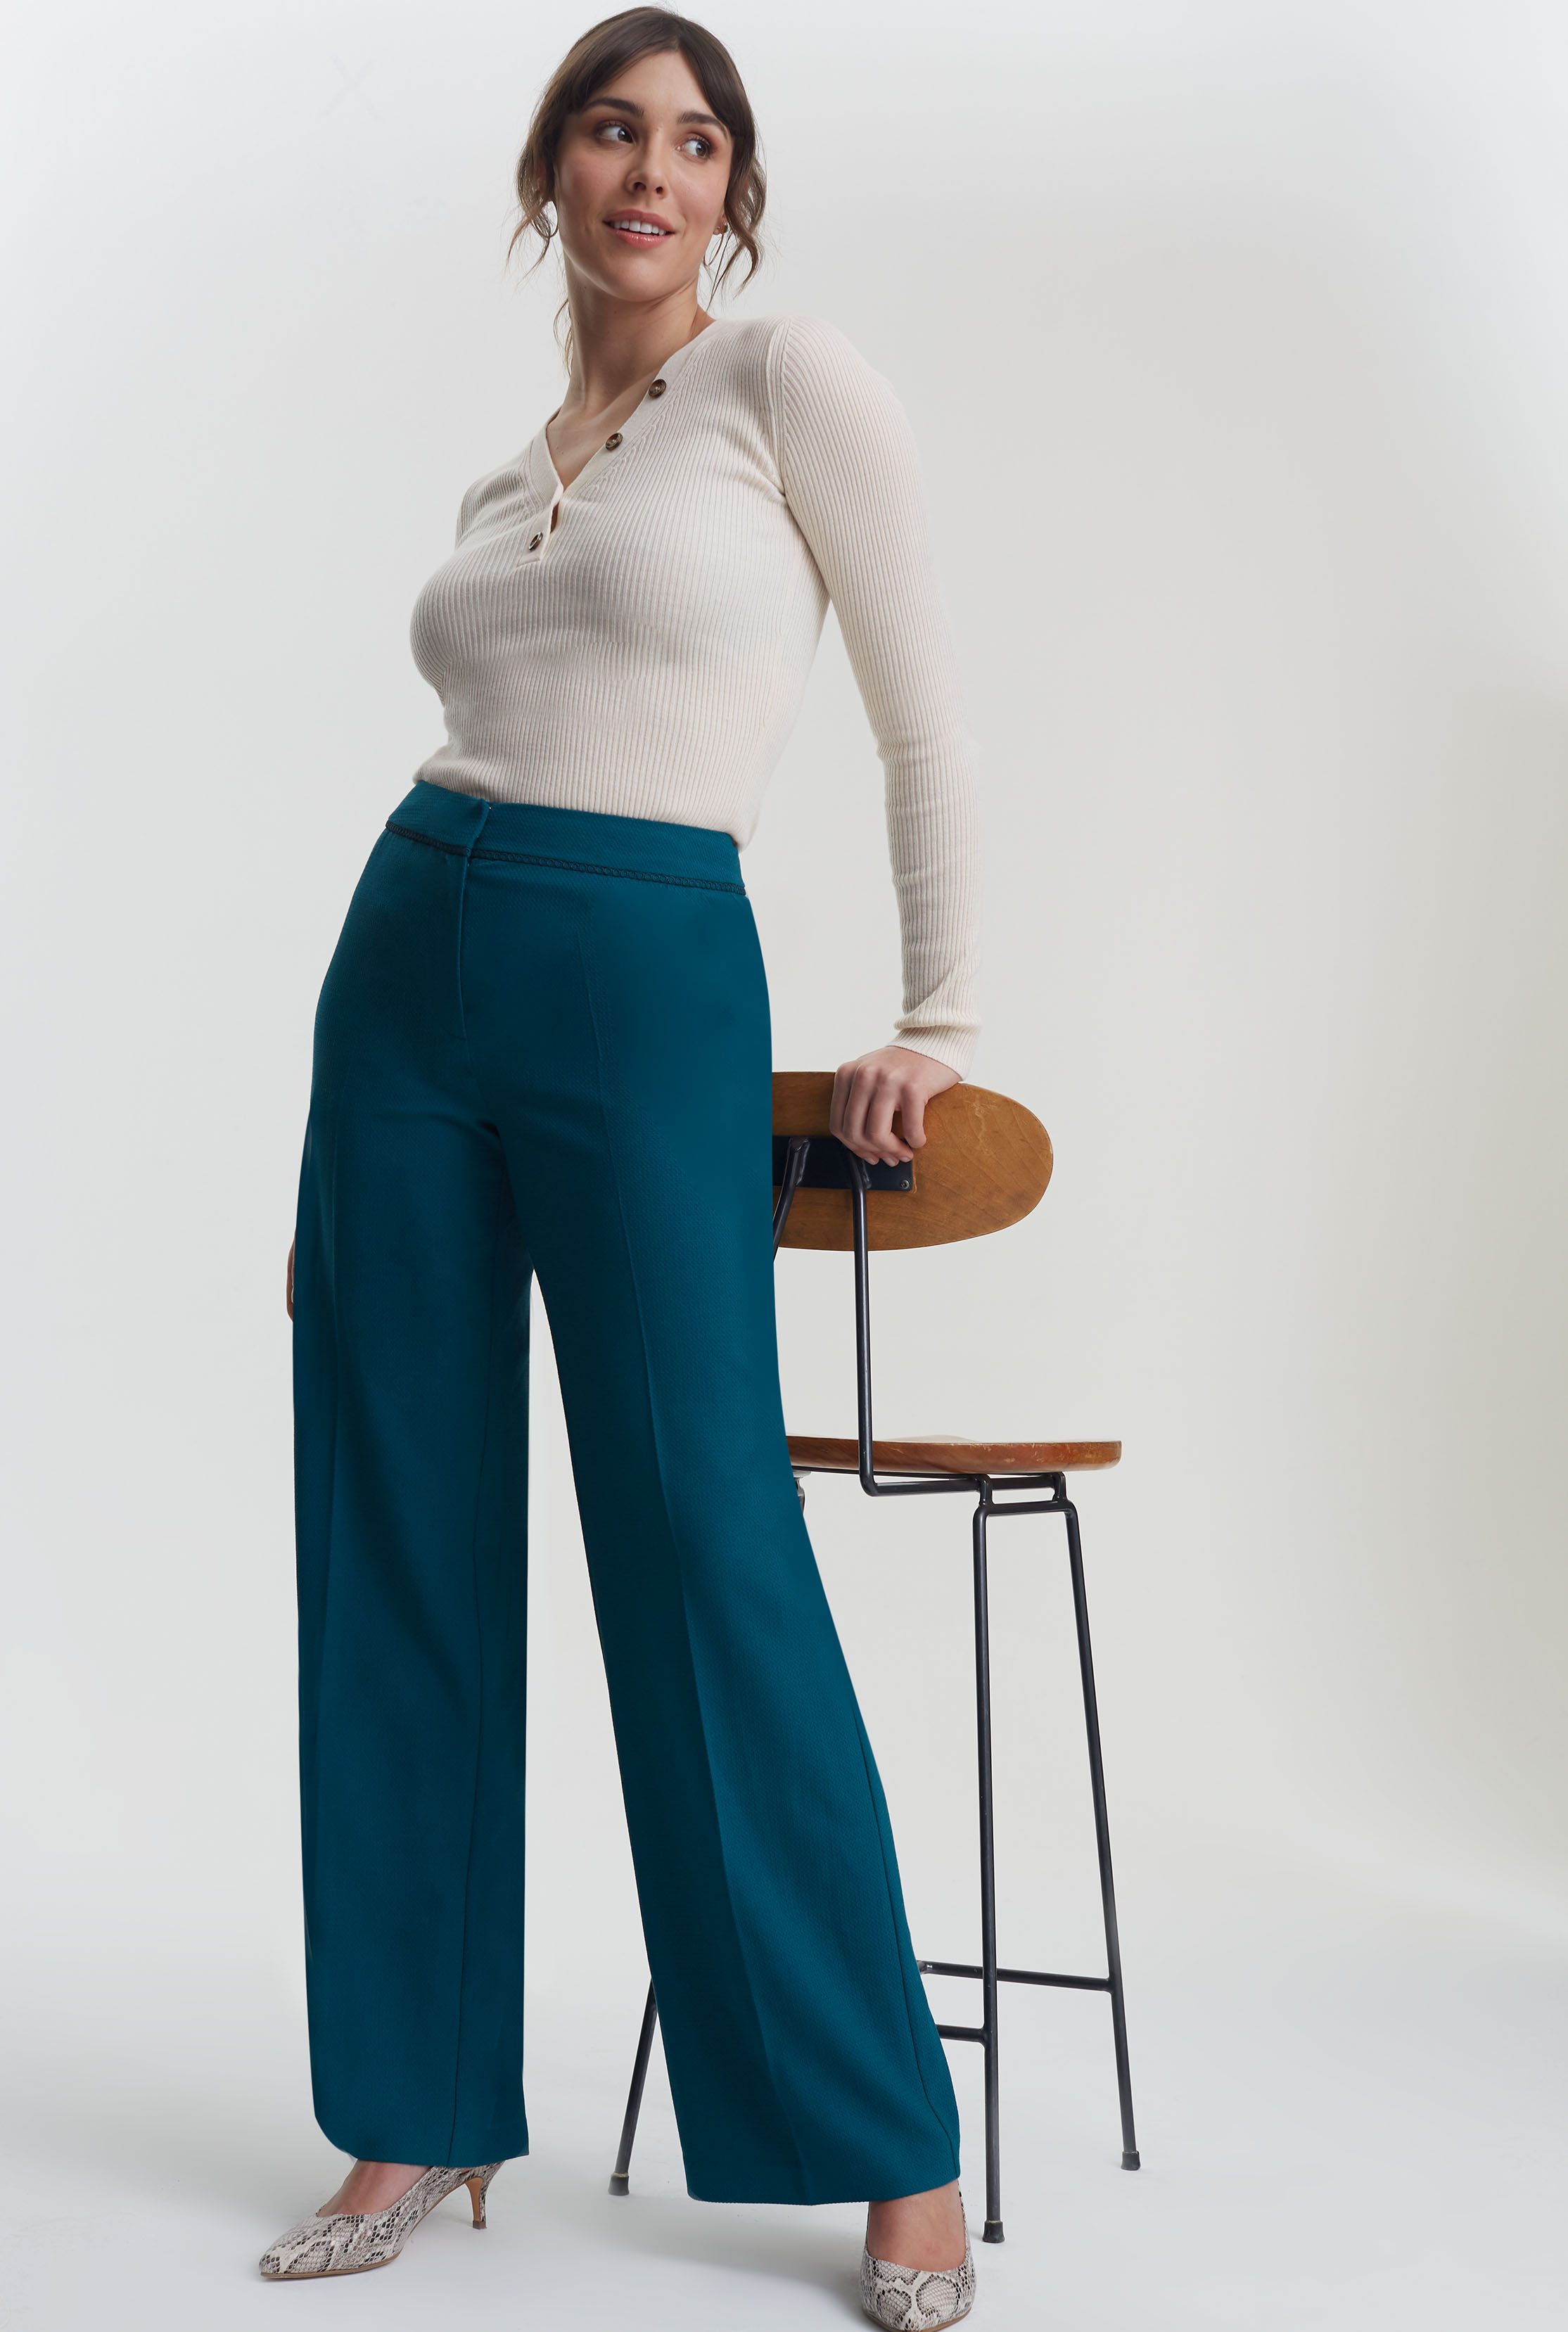 Teal Trim Textured Wide Leg Suit Pant